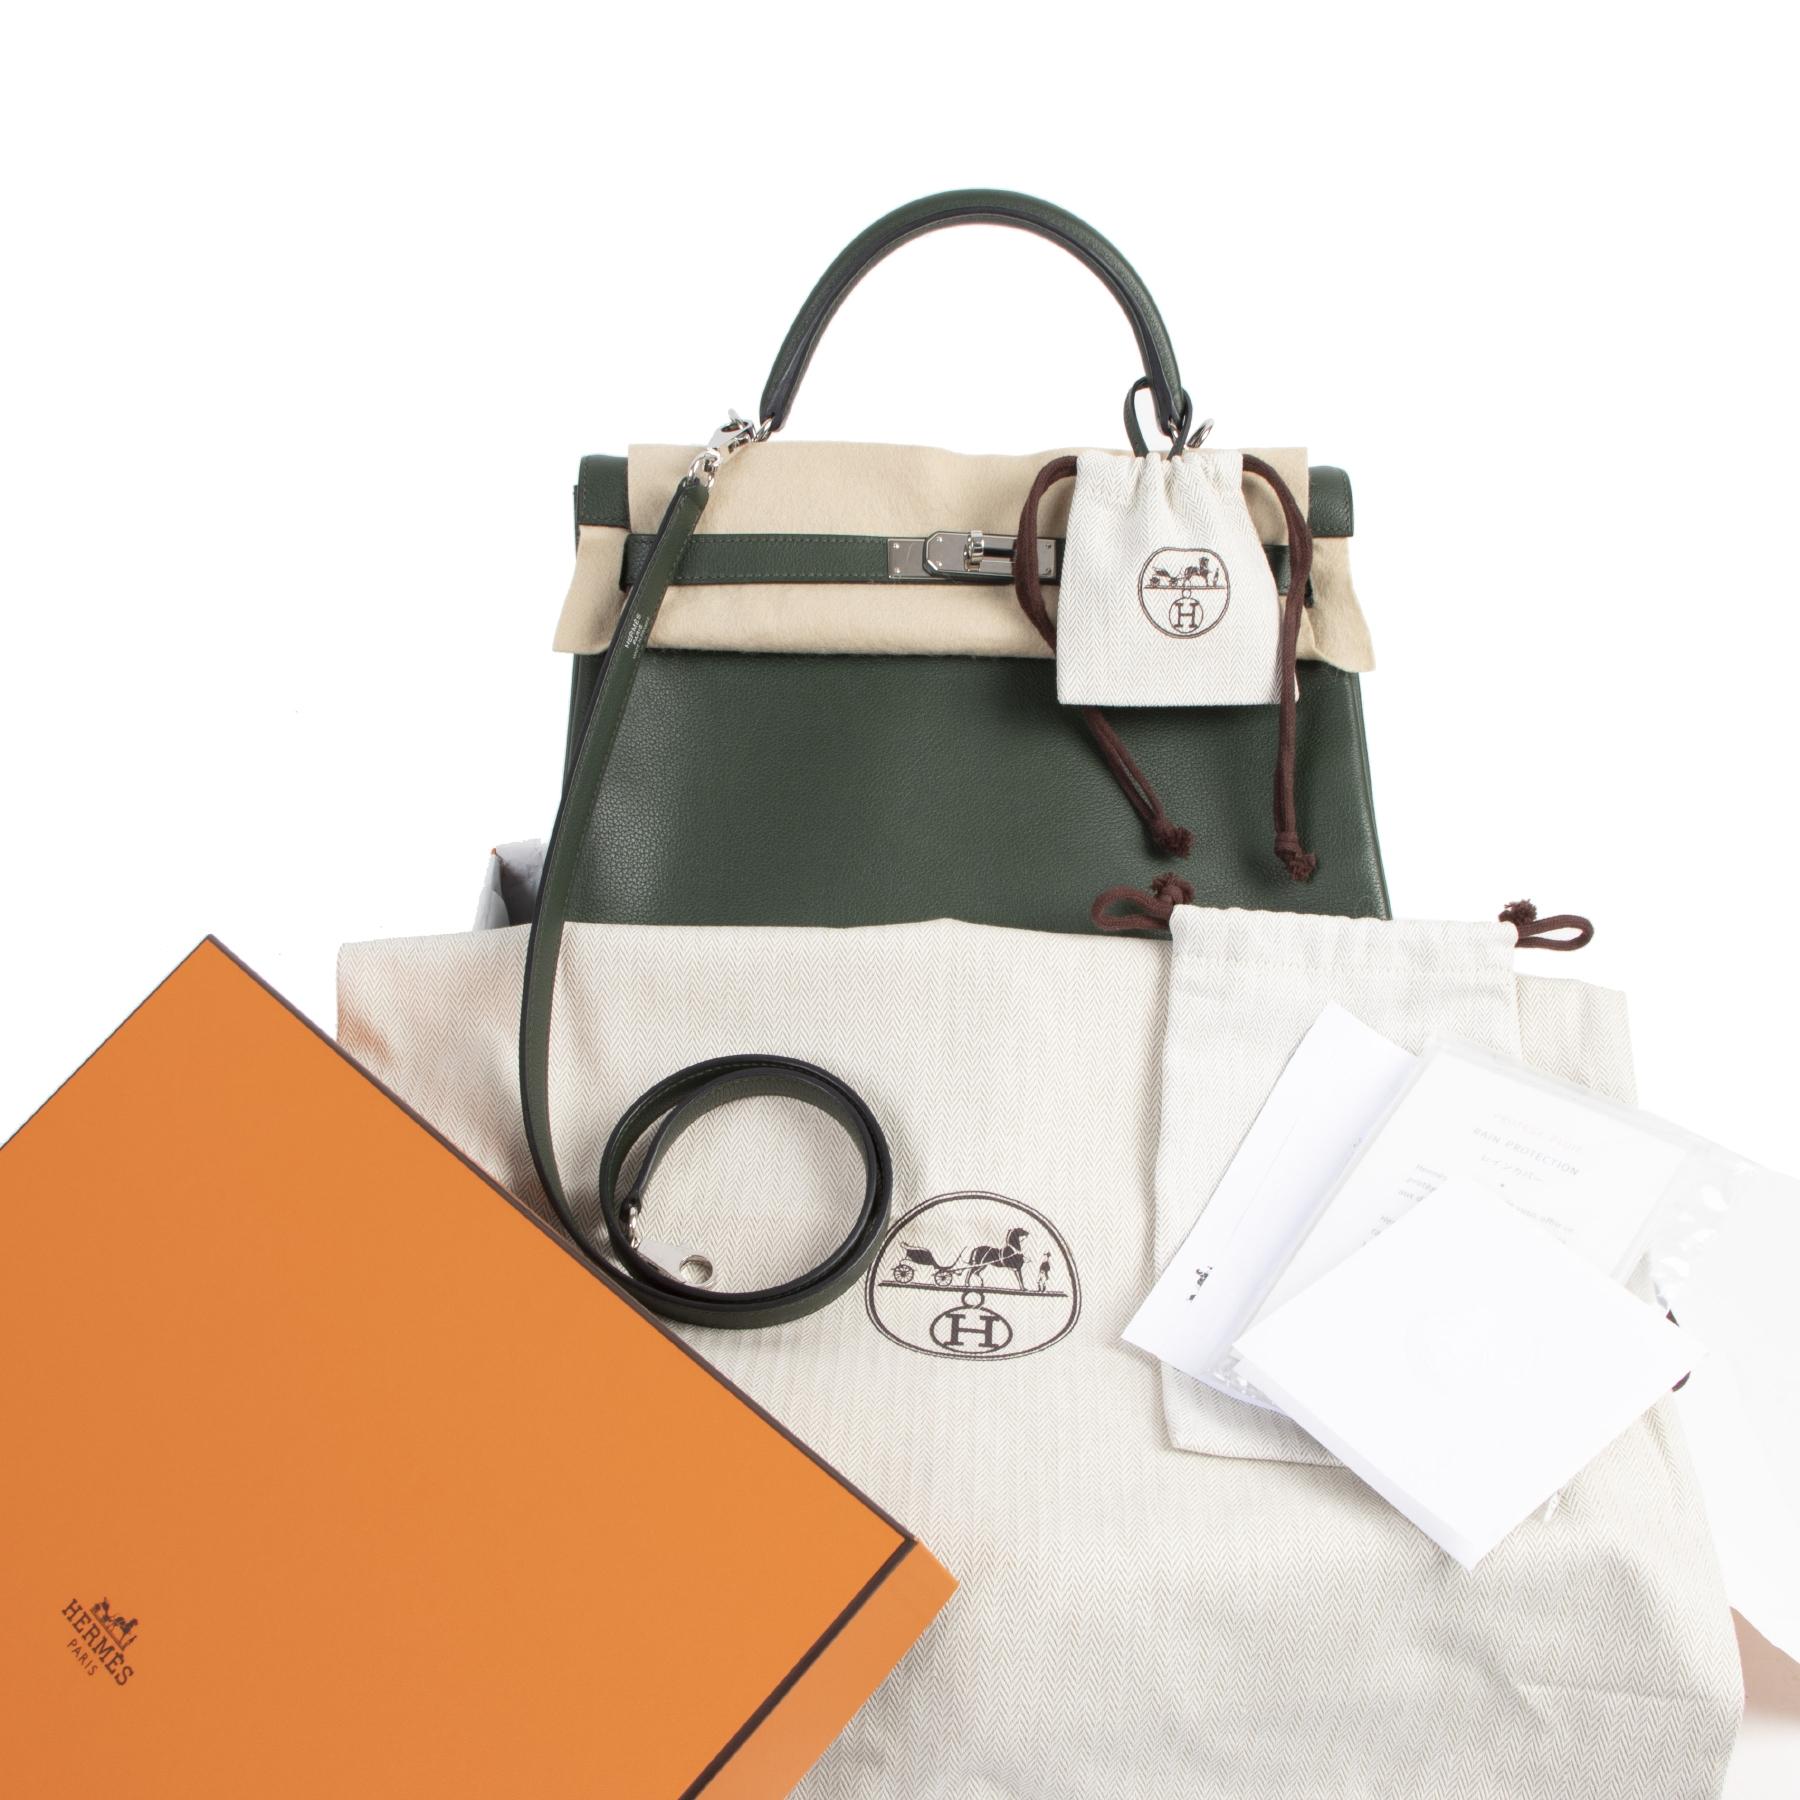 Koop en verkoop uw authentieke designer Hermes Kelly 32cm Vert Anglais Veau Evercolor PHW